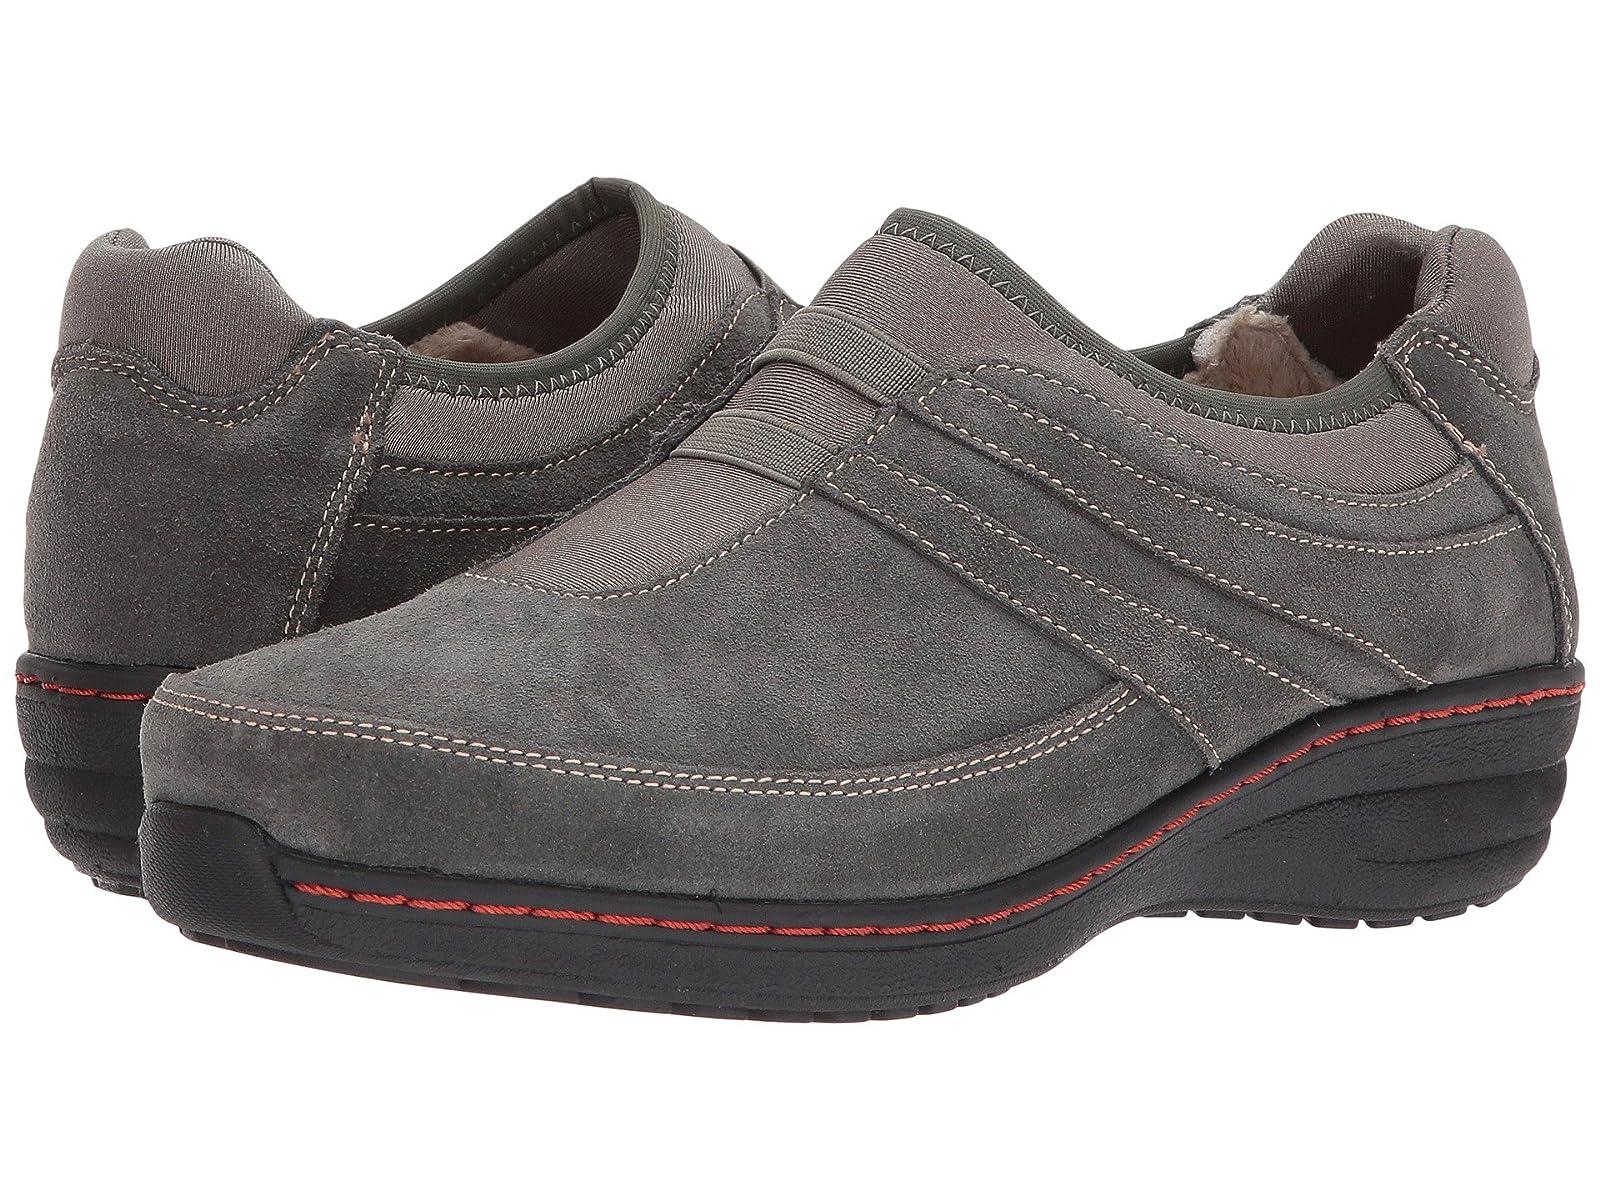 Aetrex KimberCheap and distinctive eye-catching shoes